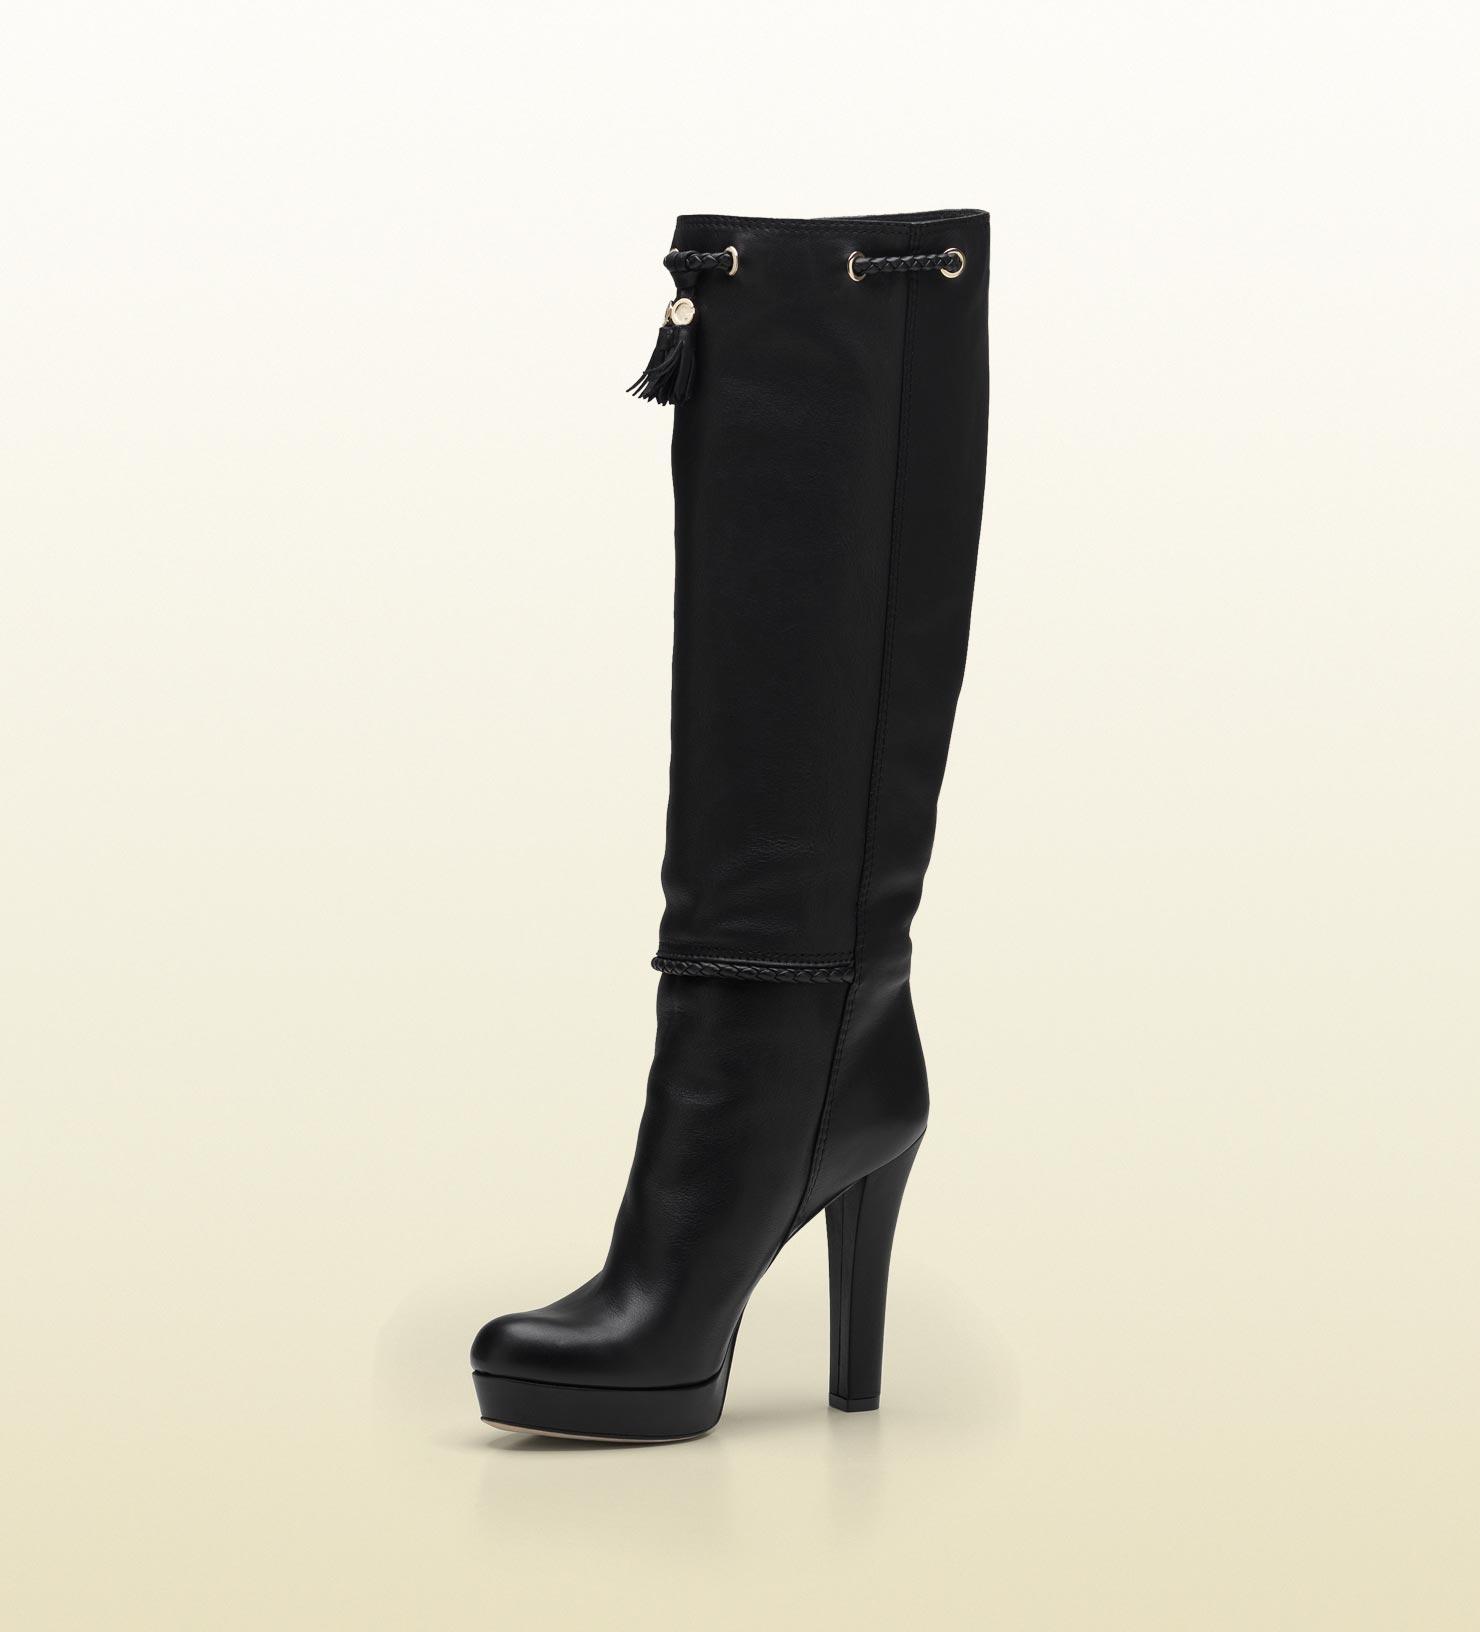 957ce23e2a7 Gucci Marrakech High Heel Platform Boot with Tassels and Metal G ...